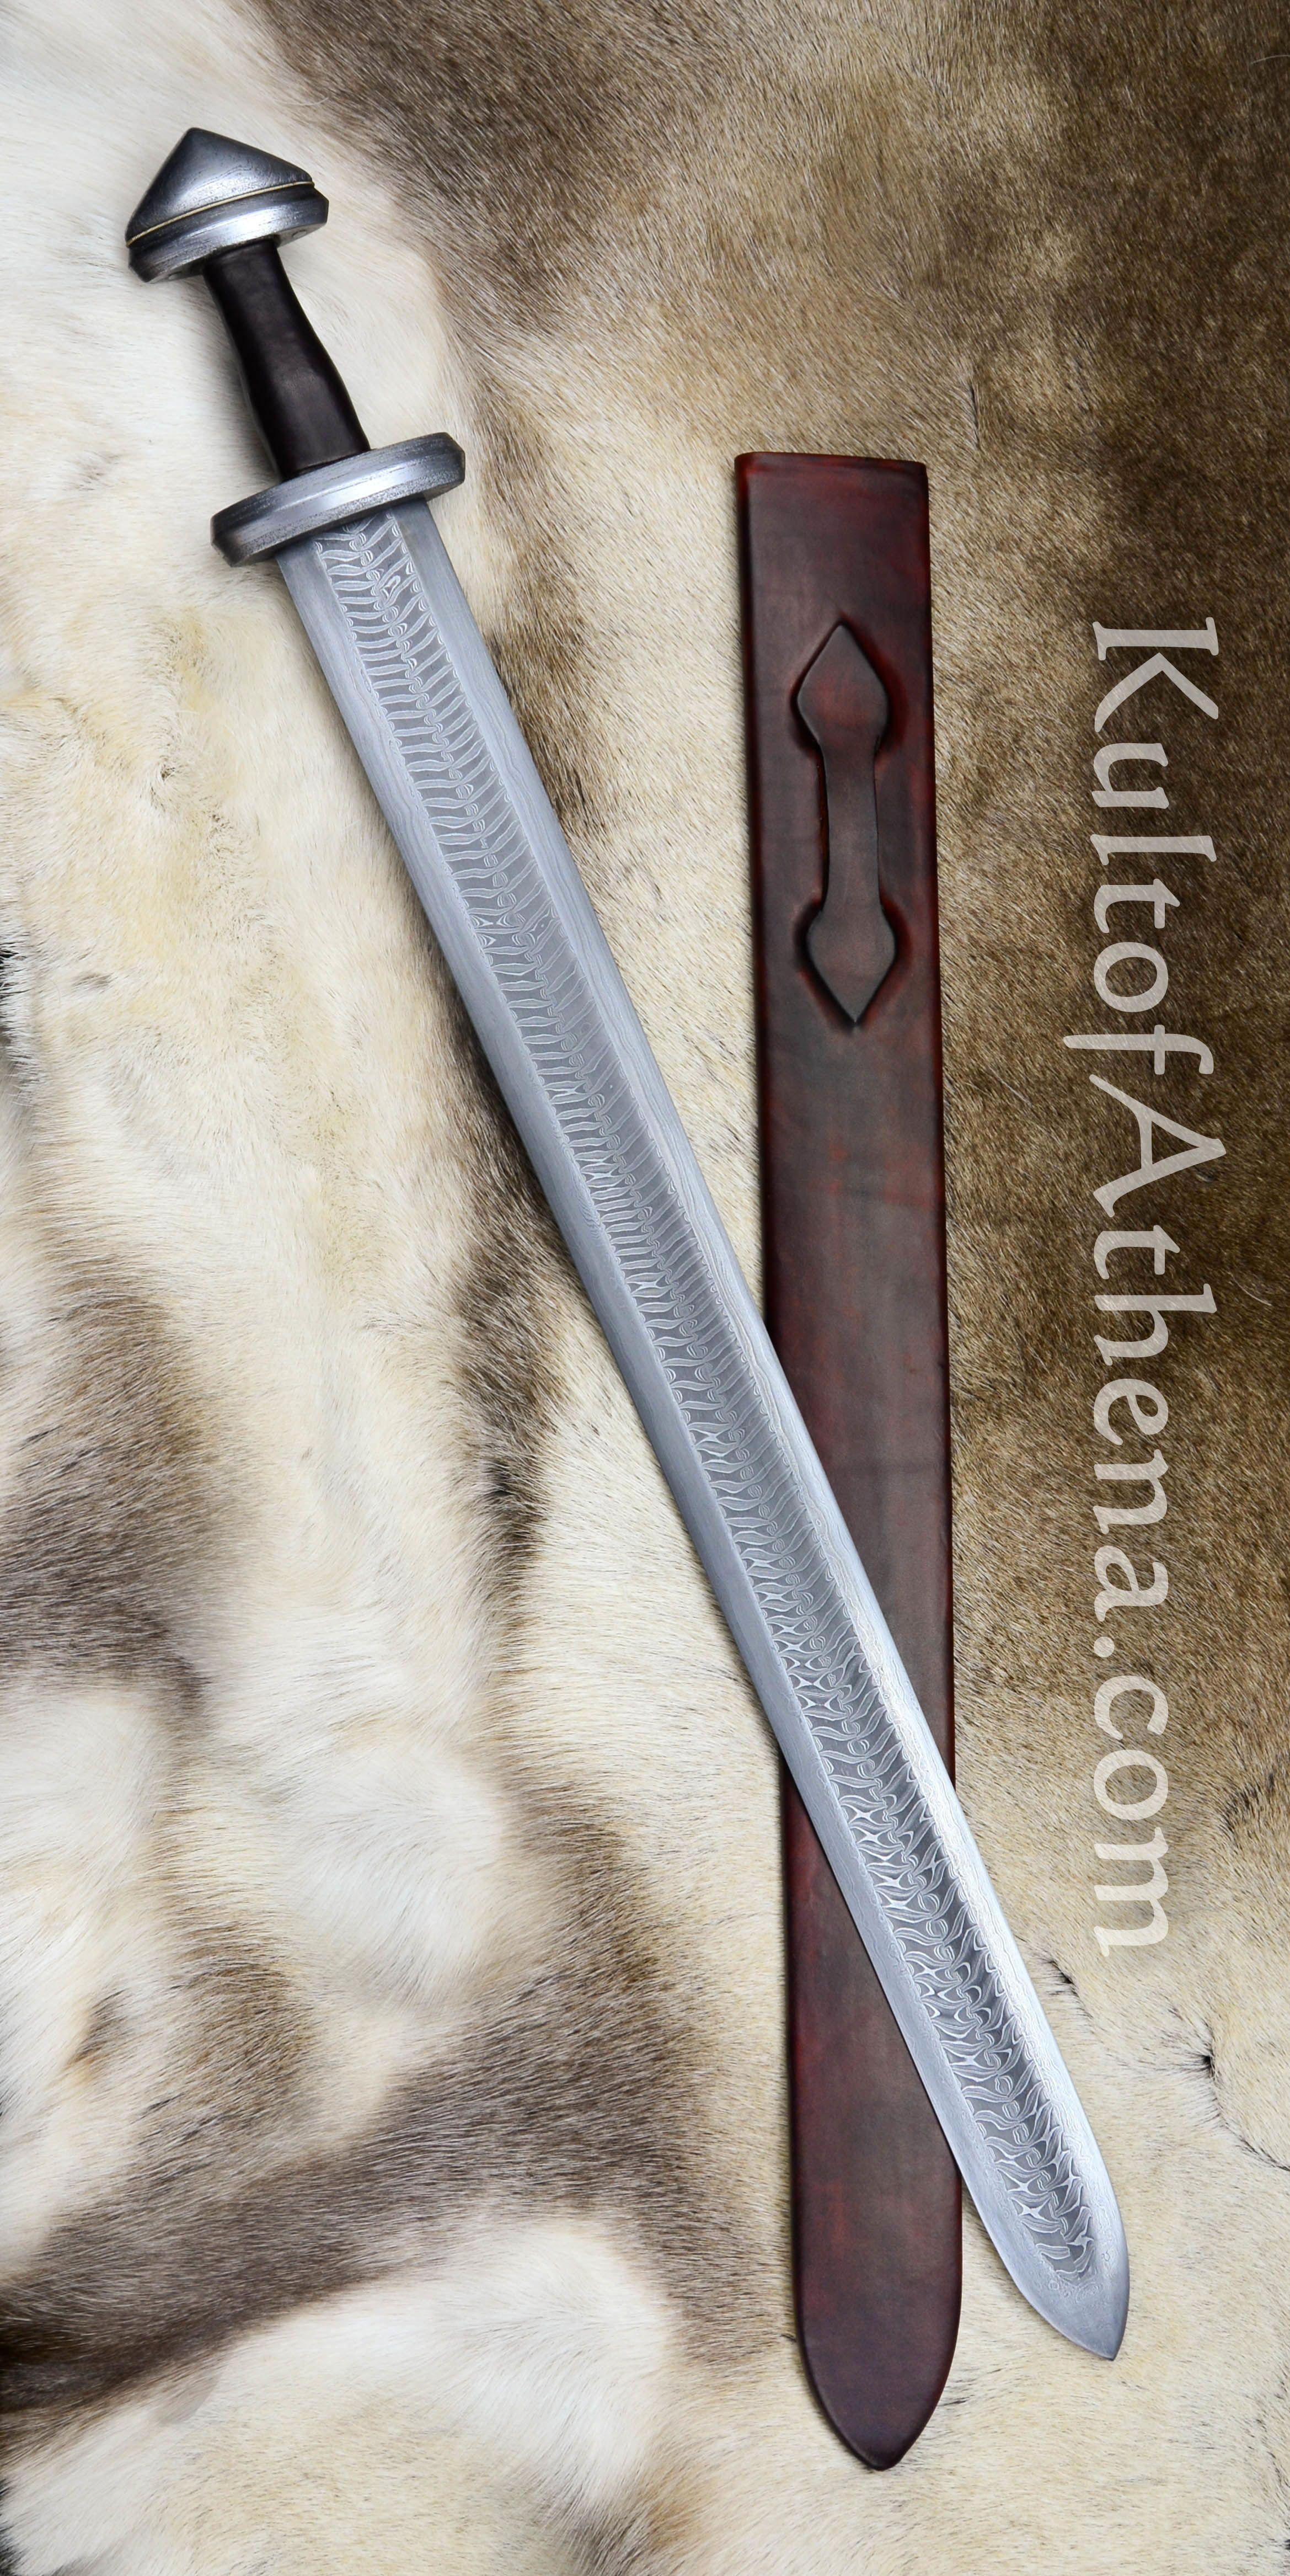 Pattern Welded Sword Awesome Ideas